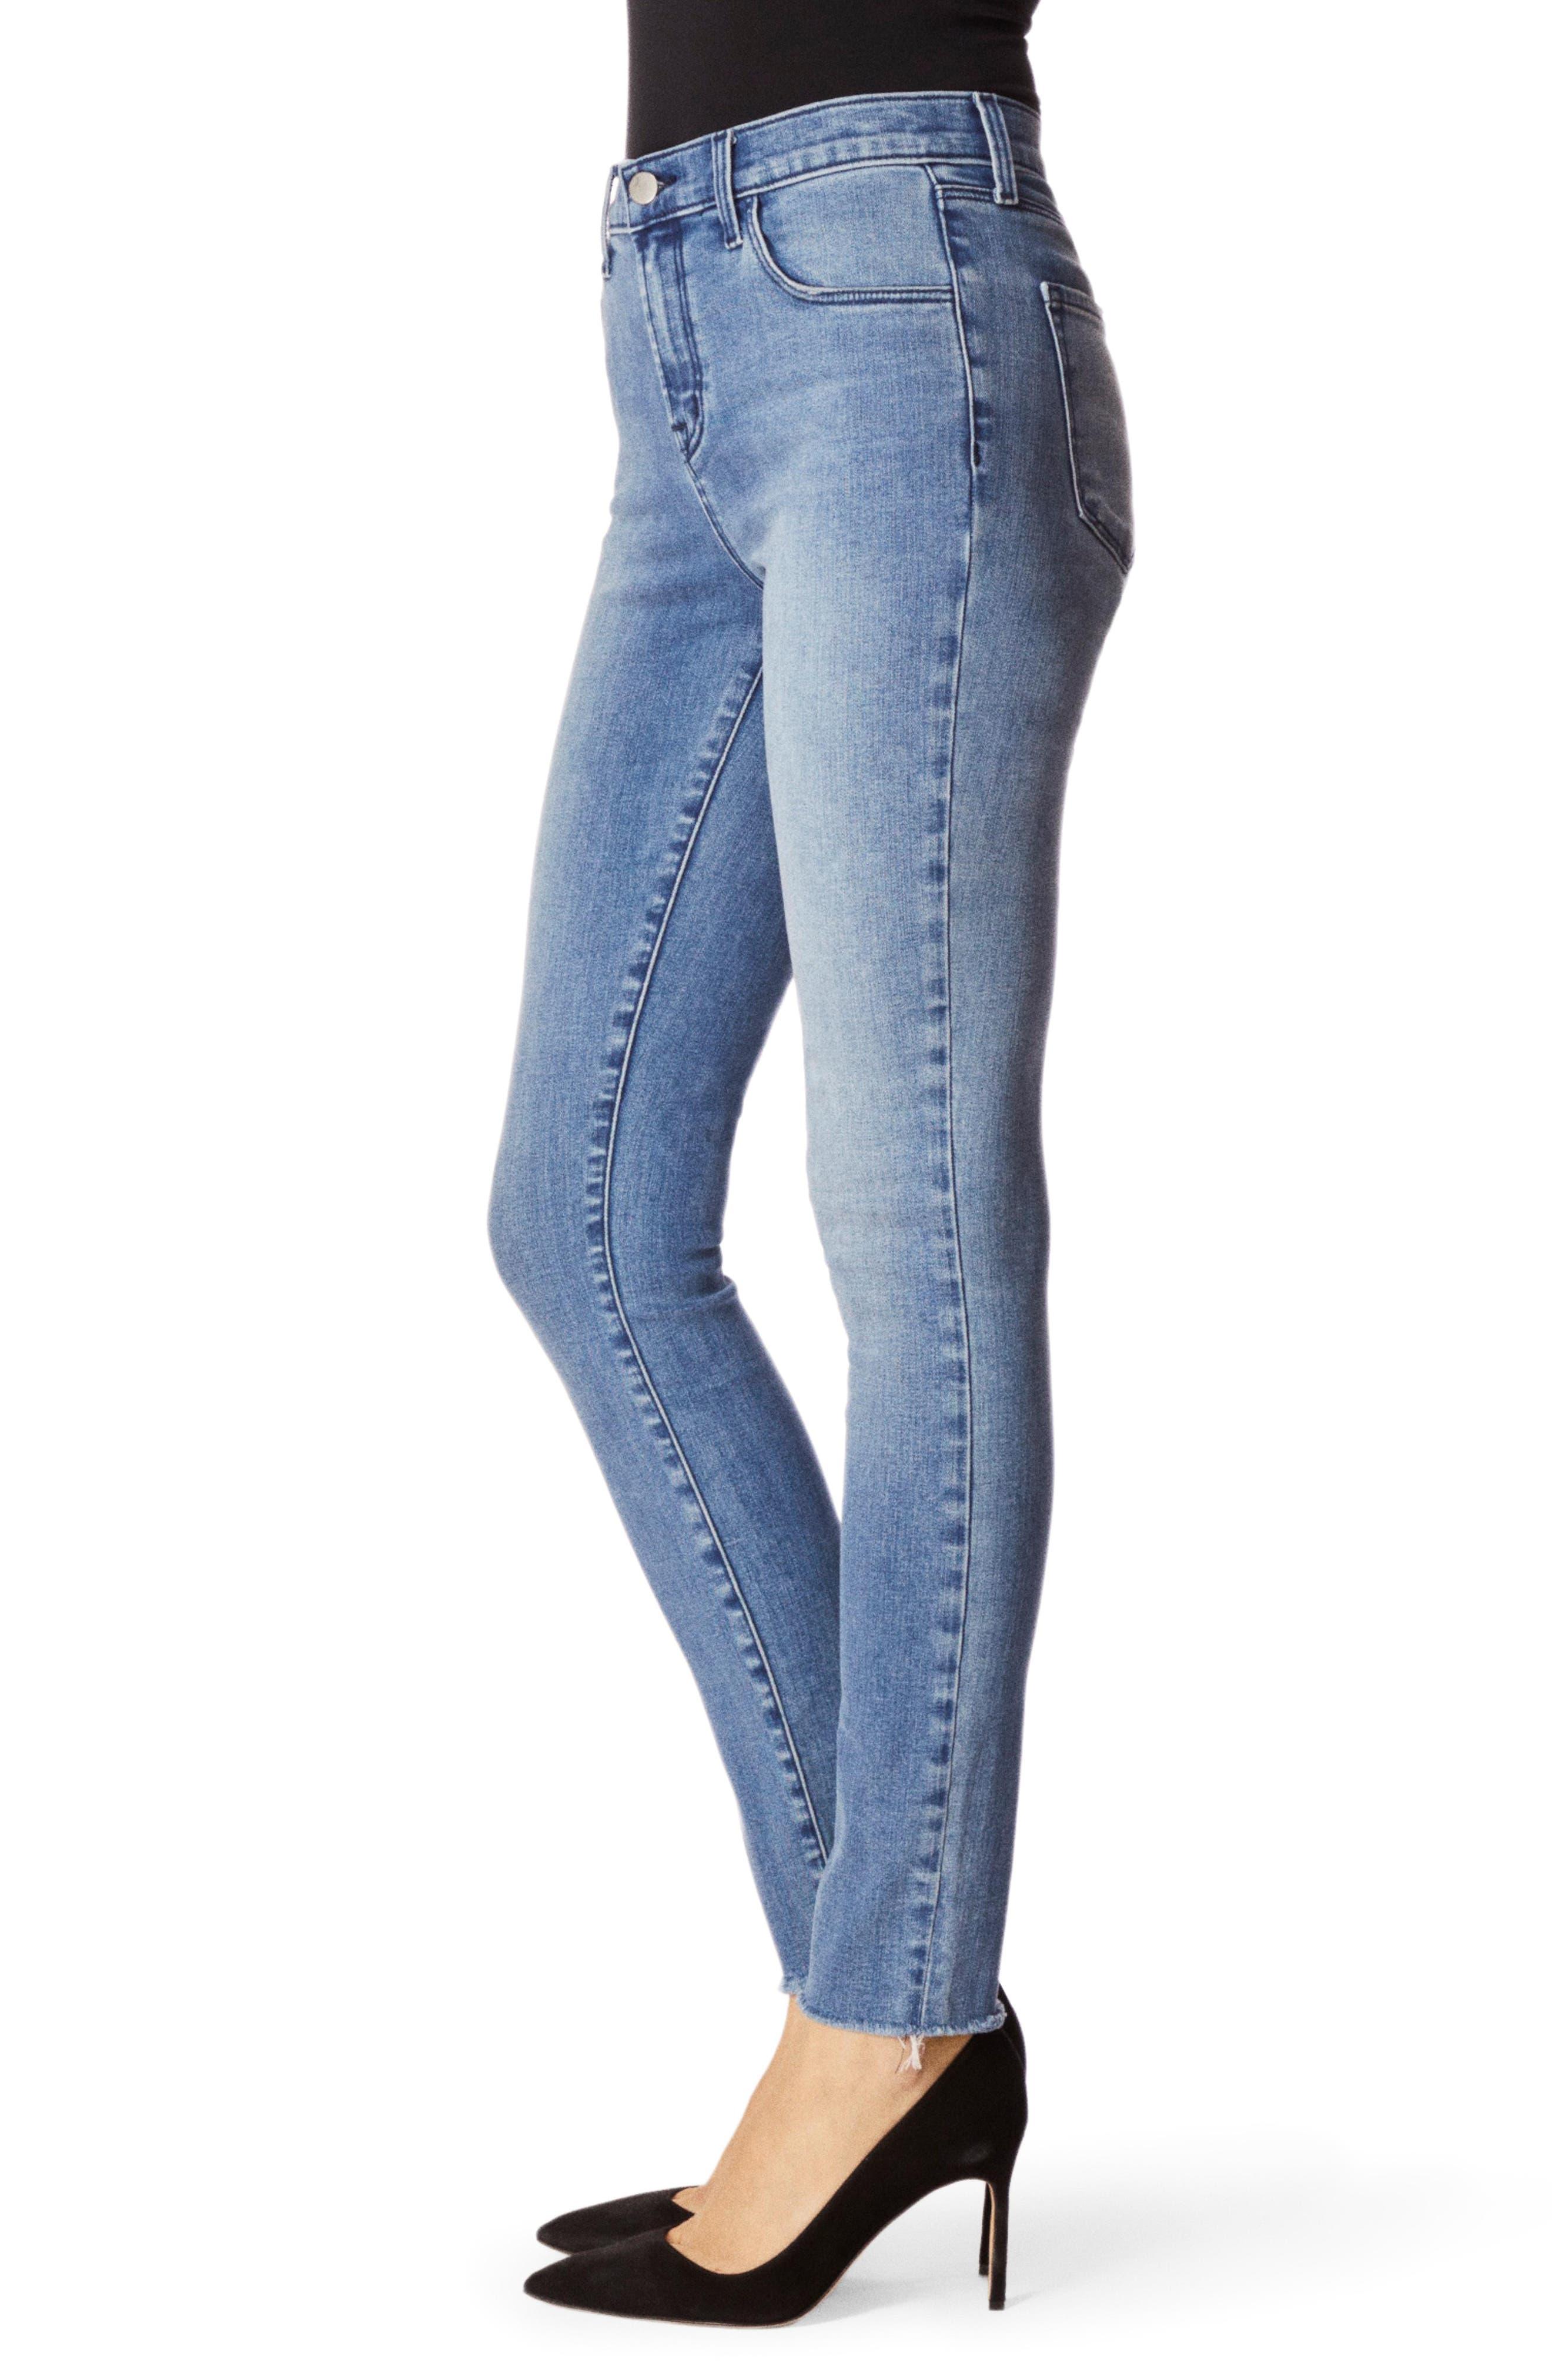 J BRAND, Maria High Waist Raw Hem Skinny Jeans, Alternate thumbnail 2, color, VEGA